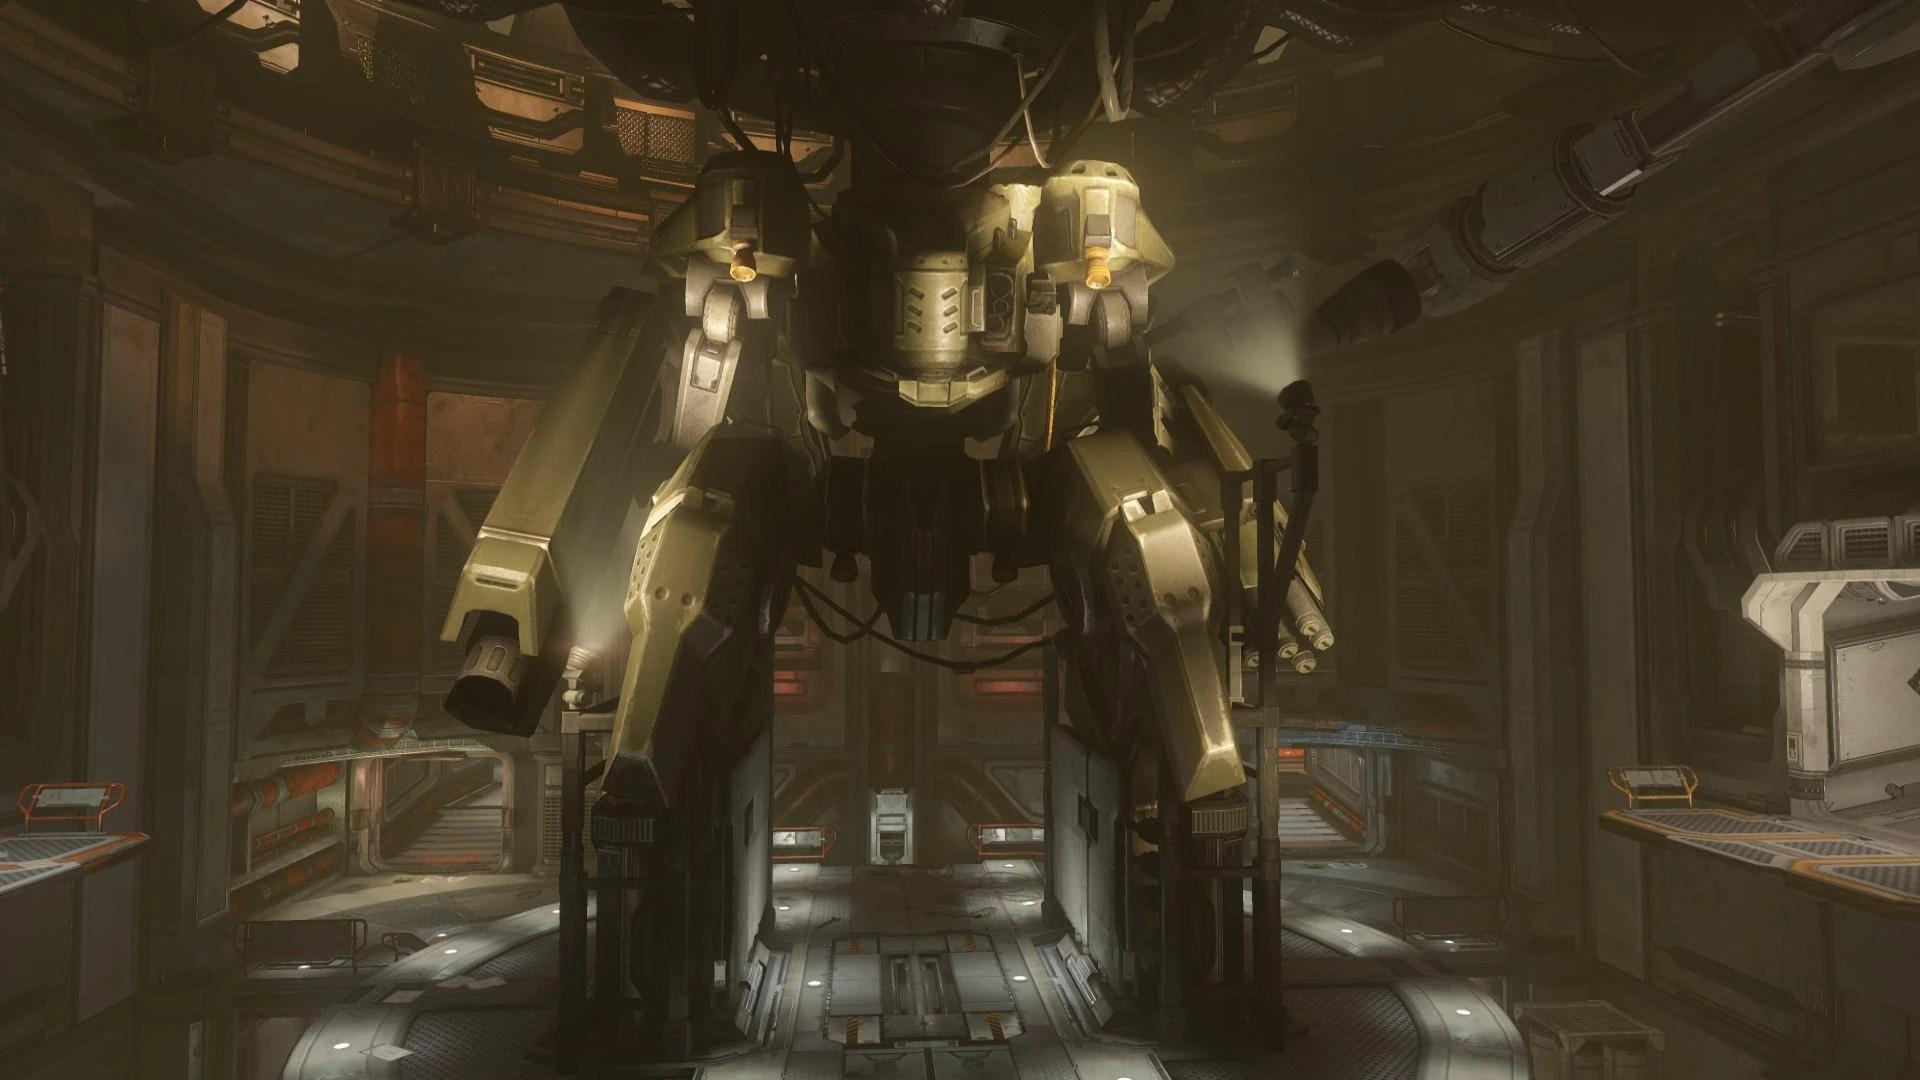 Halo Wallpaper Fall Of Reach Hrunting Mark Ii D Exoskeleton Halo Nation Fandom